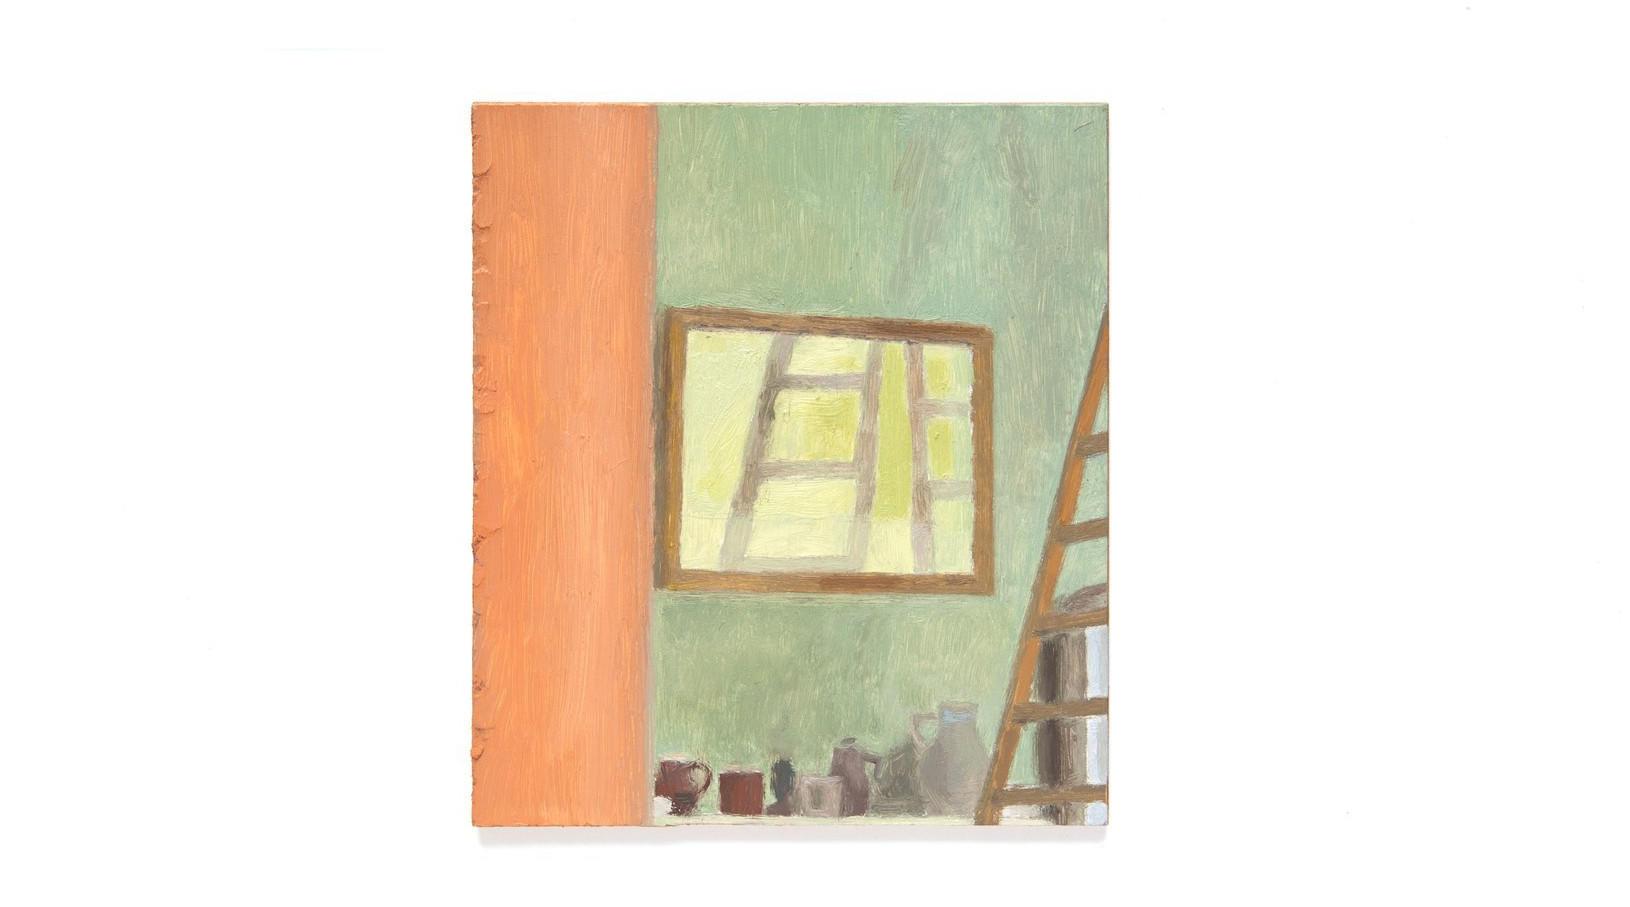 """Studio Corner (Cezanne)"" by Eleanor Ray at the Landing"